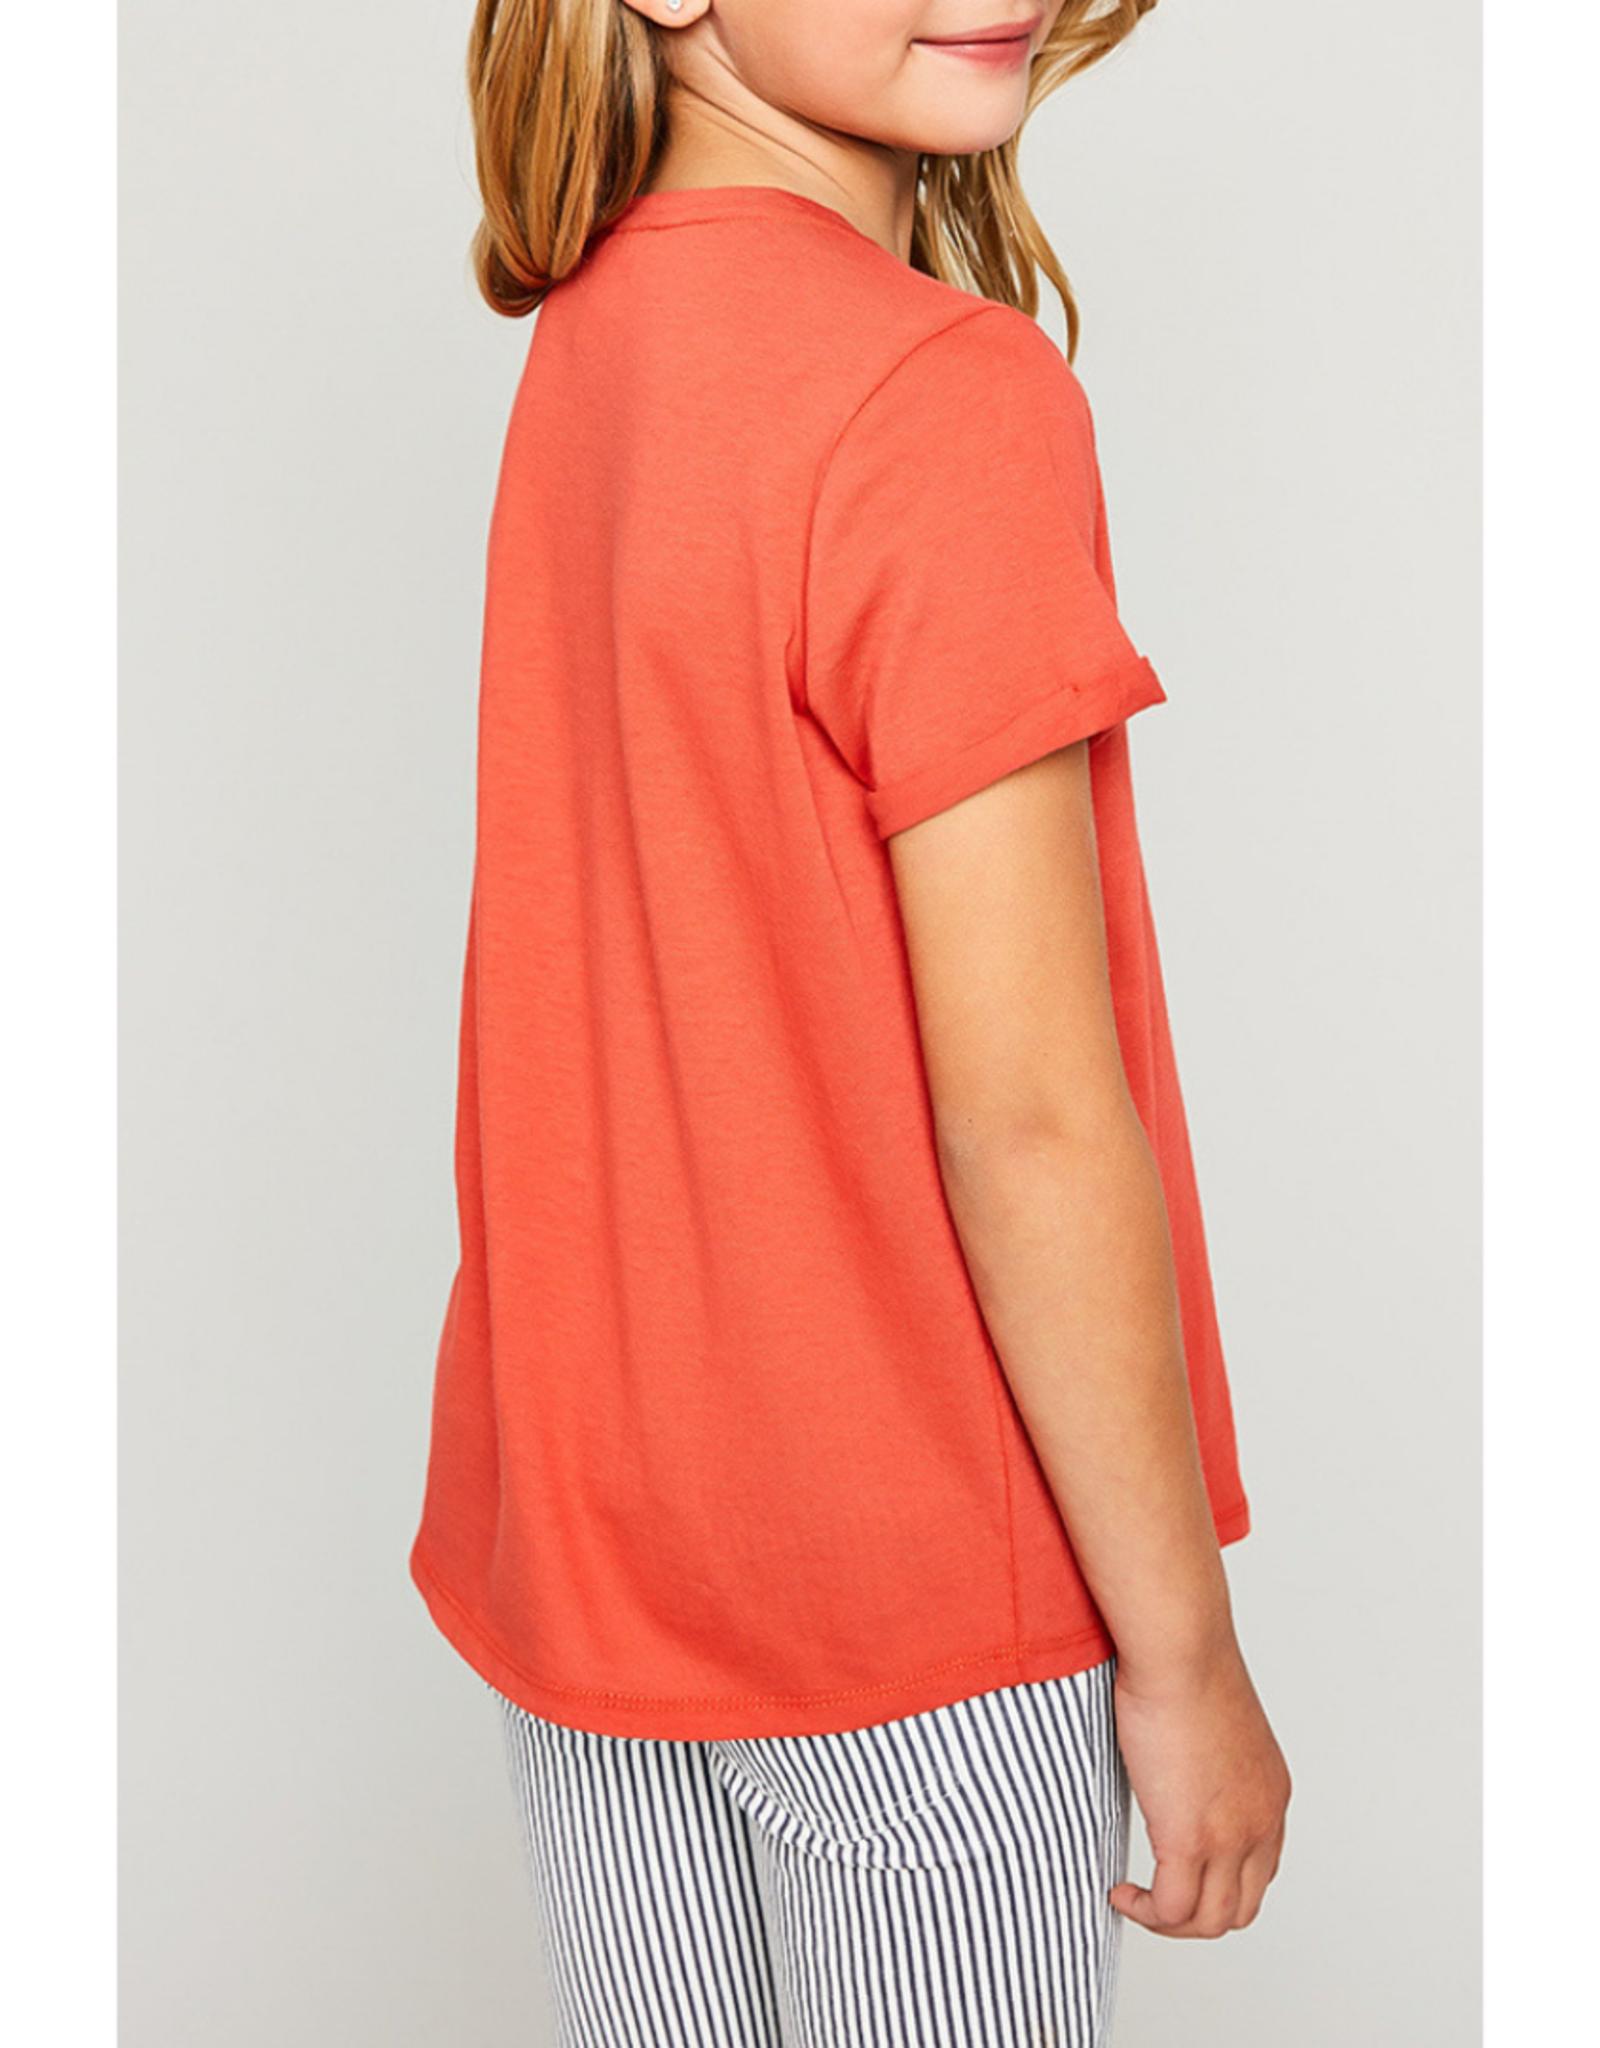 Hayden Girls Criss Cross T-Shirt - Tomato